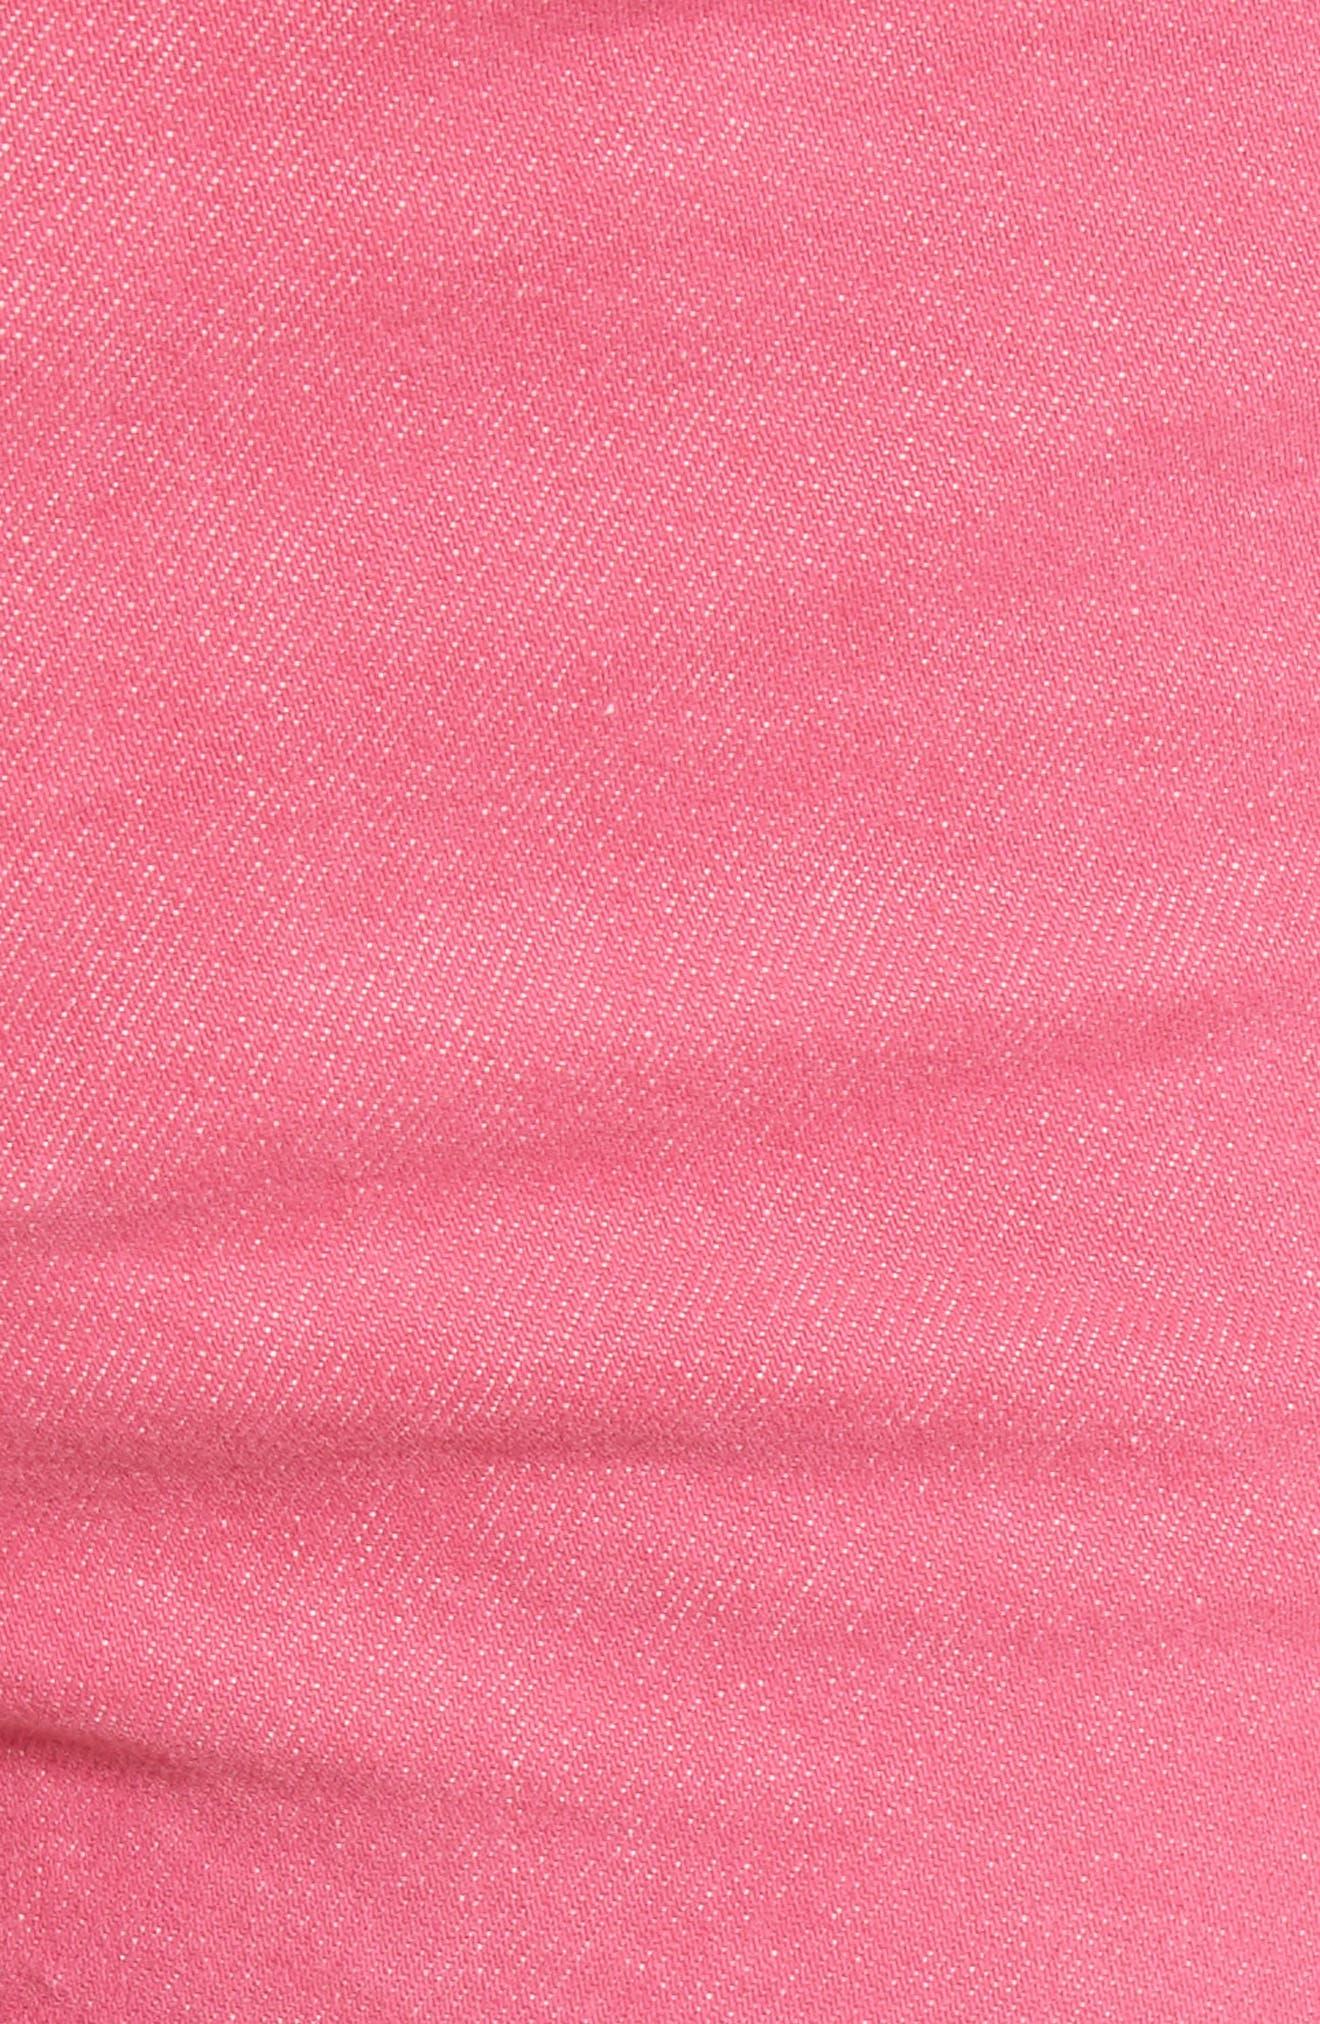 Justine High Waist Denim Shorts,                             Alternate thumbnail 6, color,                             Bull Pink